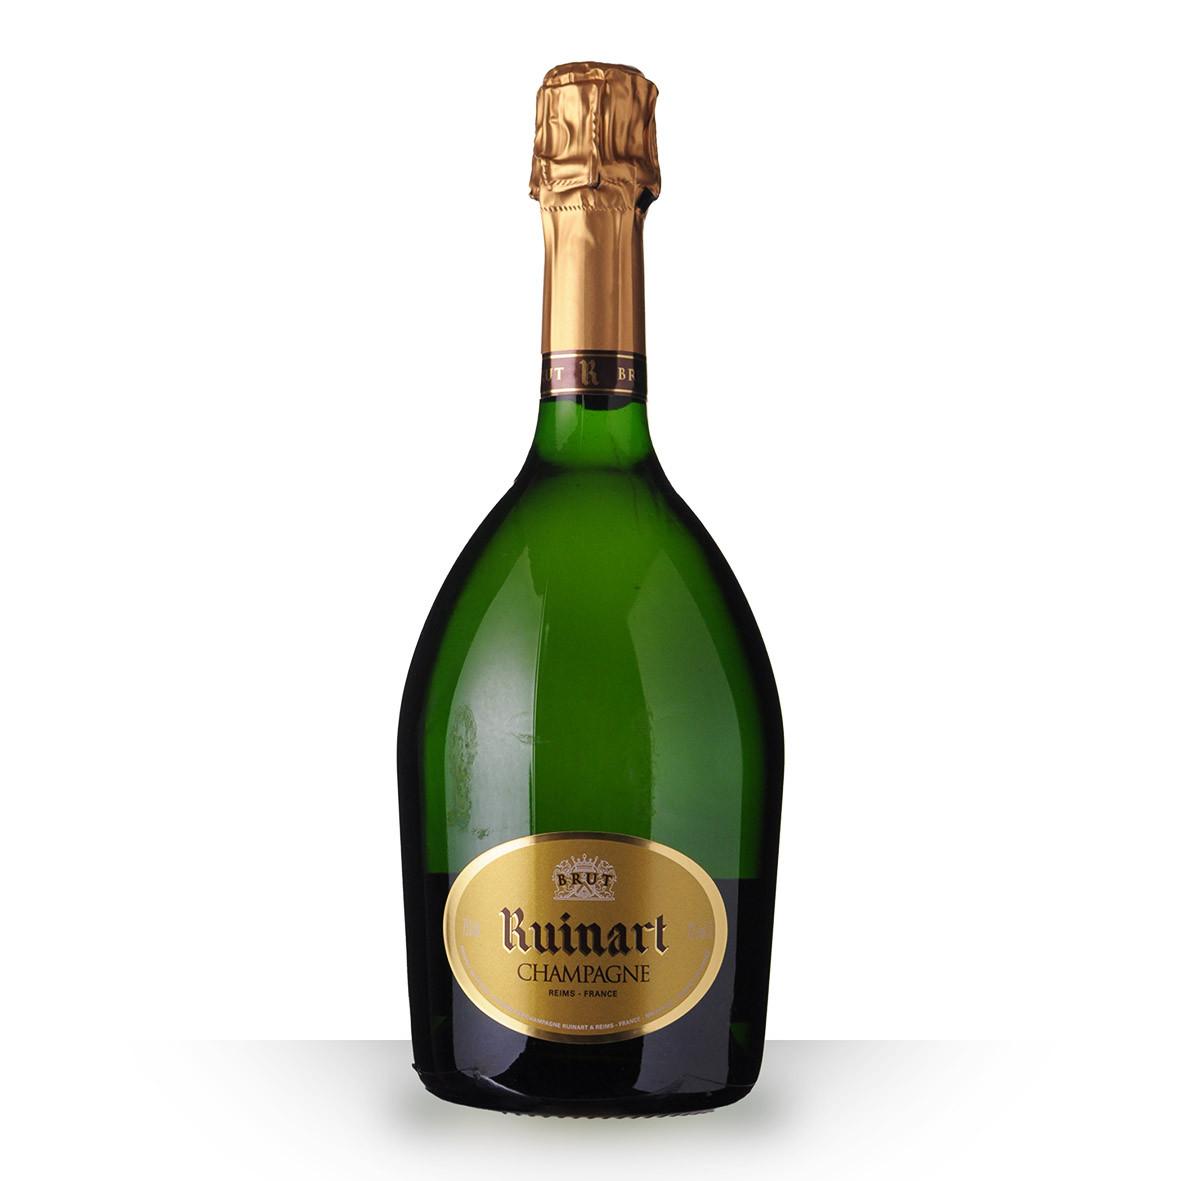 Champagne R de Ruinart Brut 75cl www.odyssee-vins.com